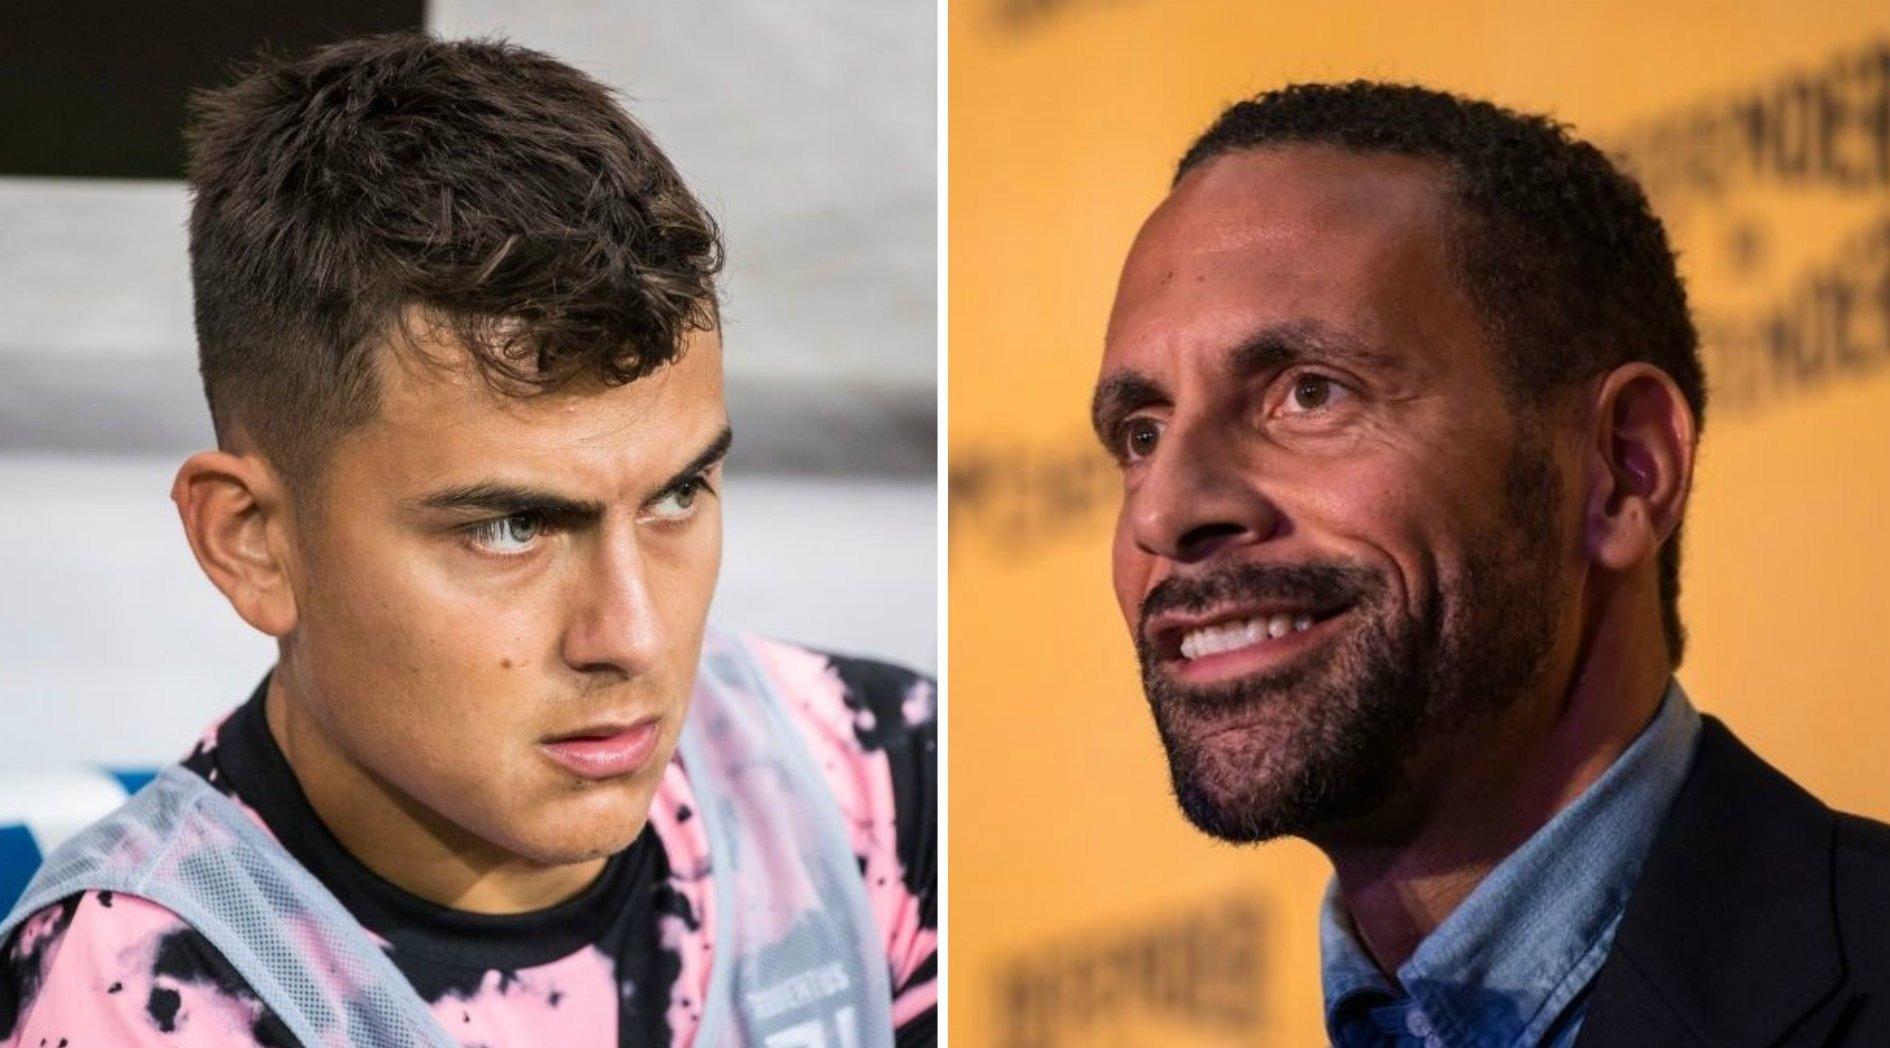 یوونتوس-ایتالیا-سری آ-Juventus-آرژانتین-انگلستان-منچستریونایتد-Serie A